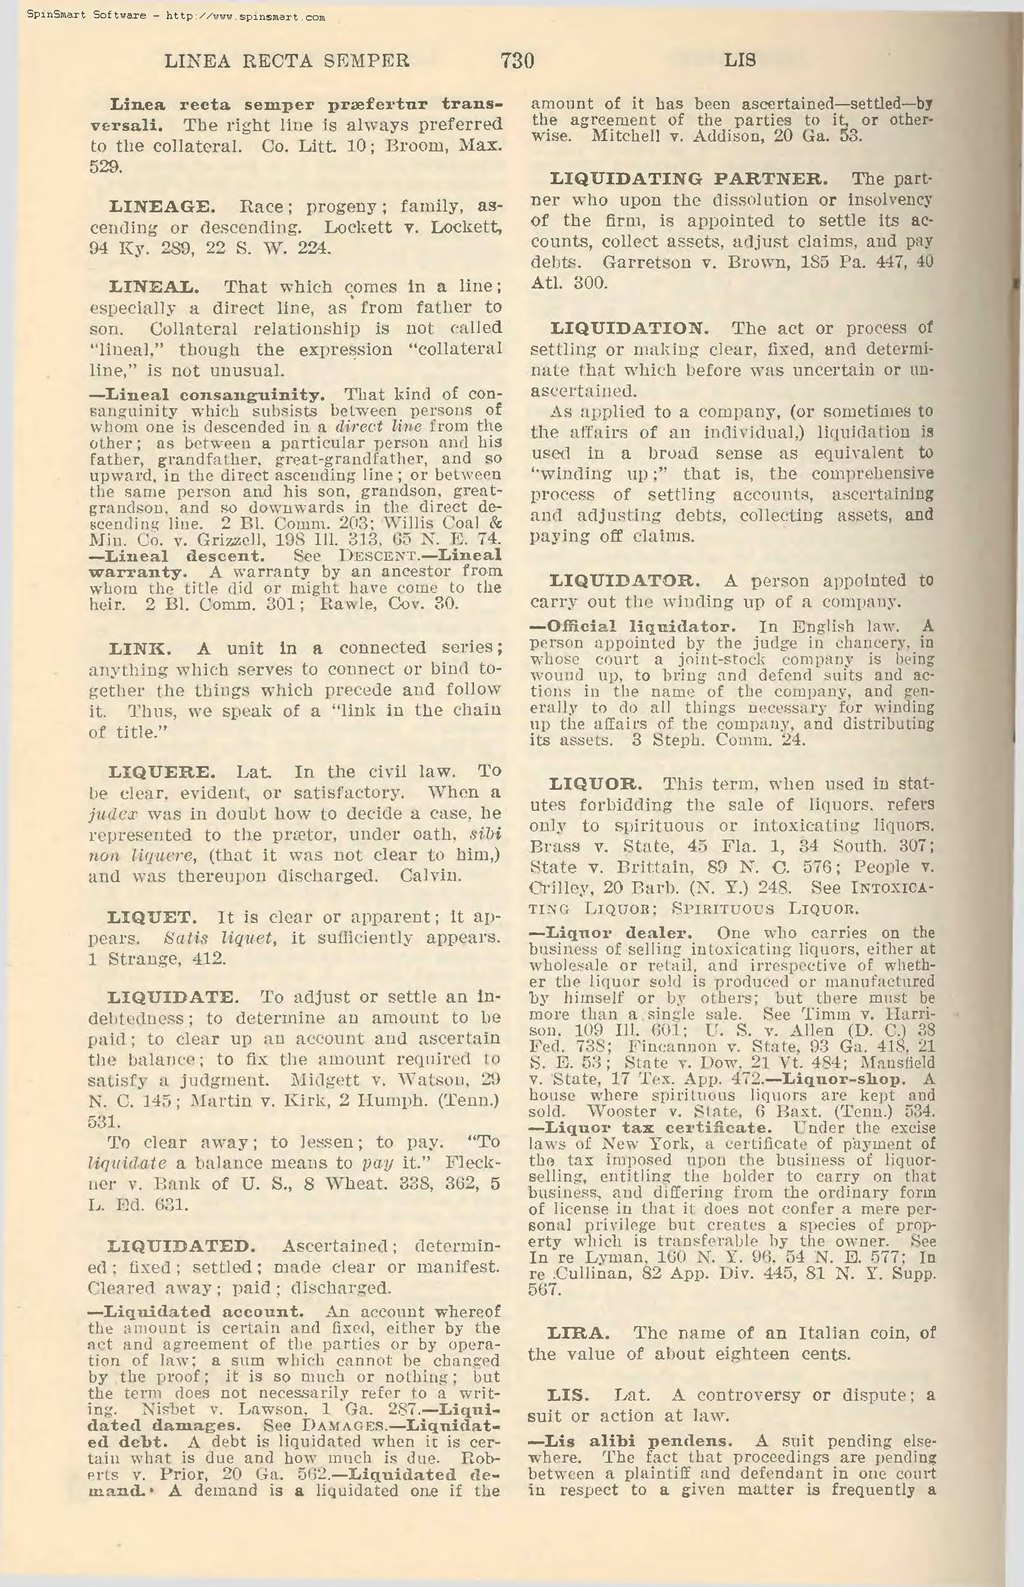 Liquidating agreement definition dictionary